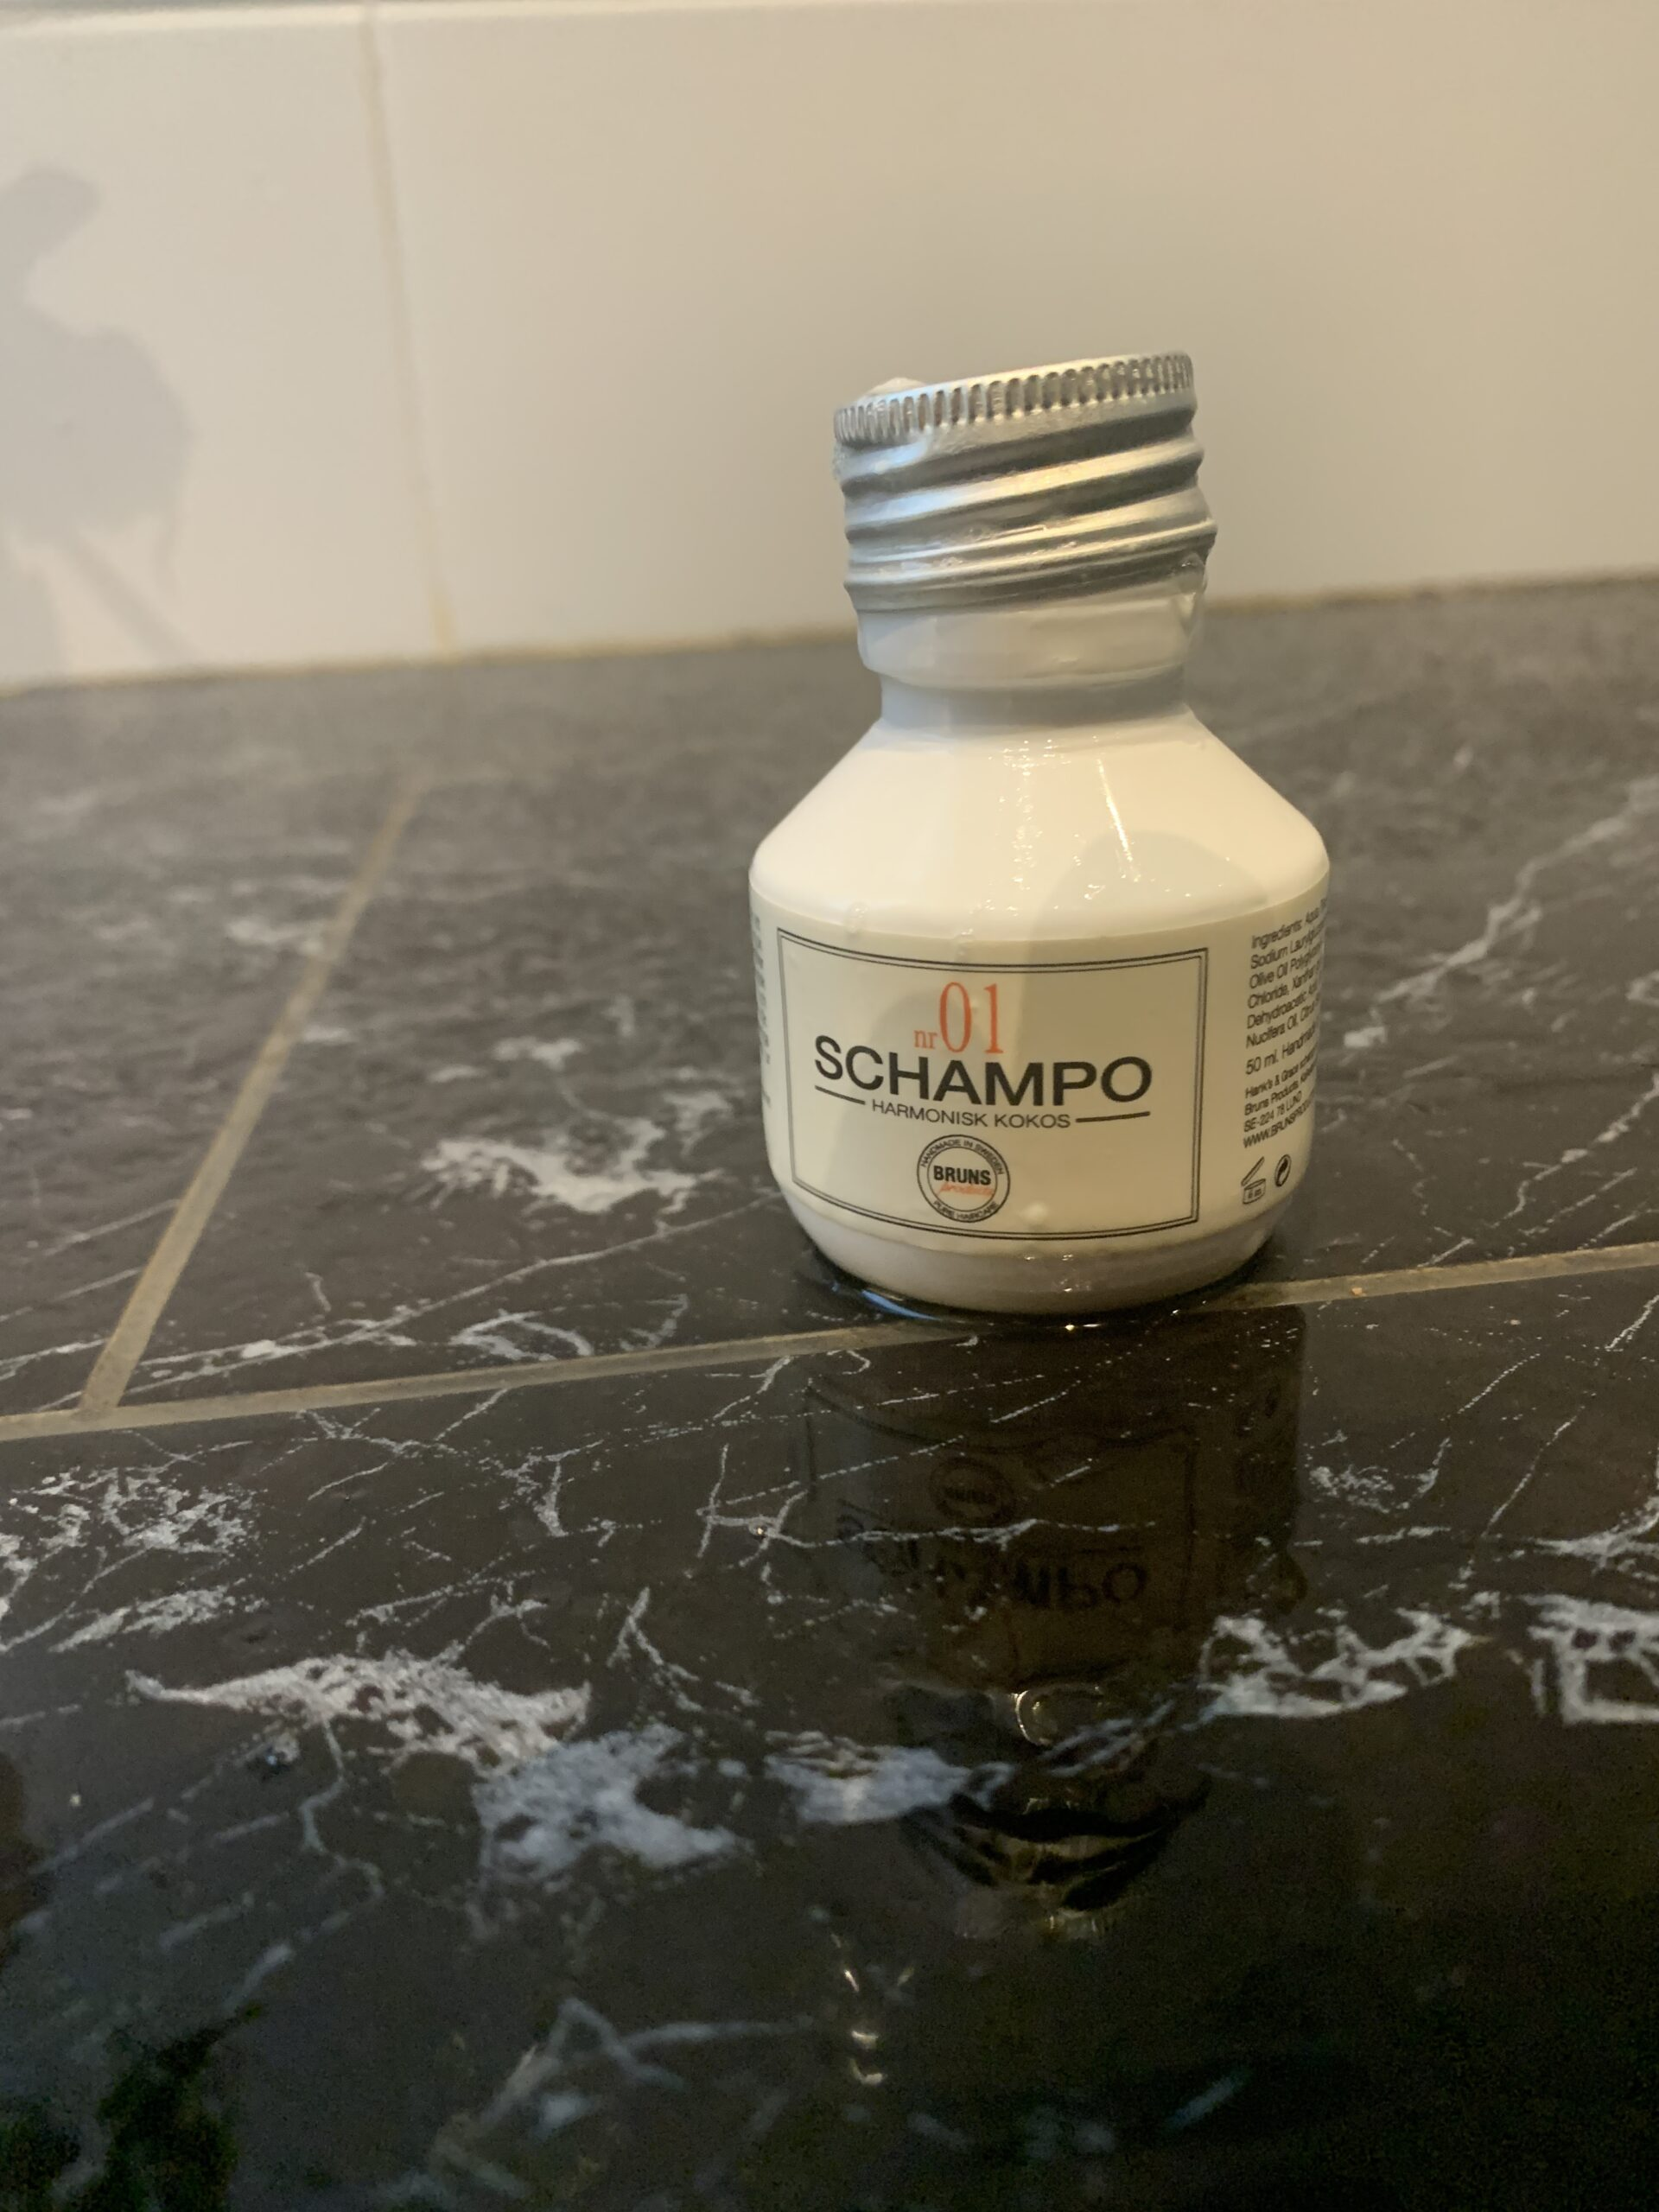 Bruns schampo 01